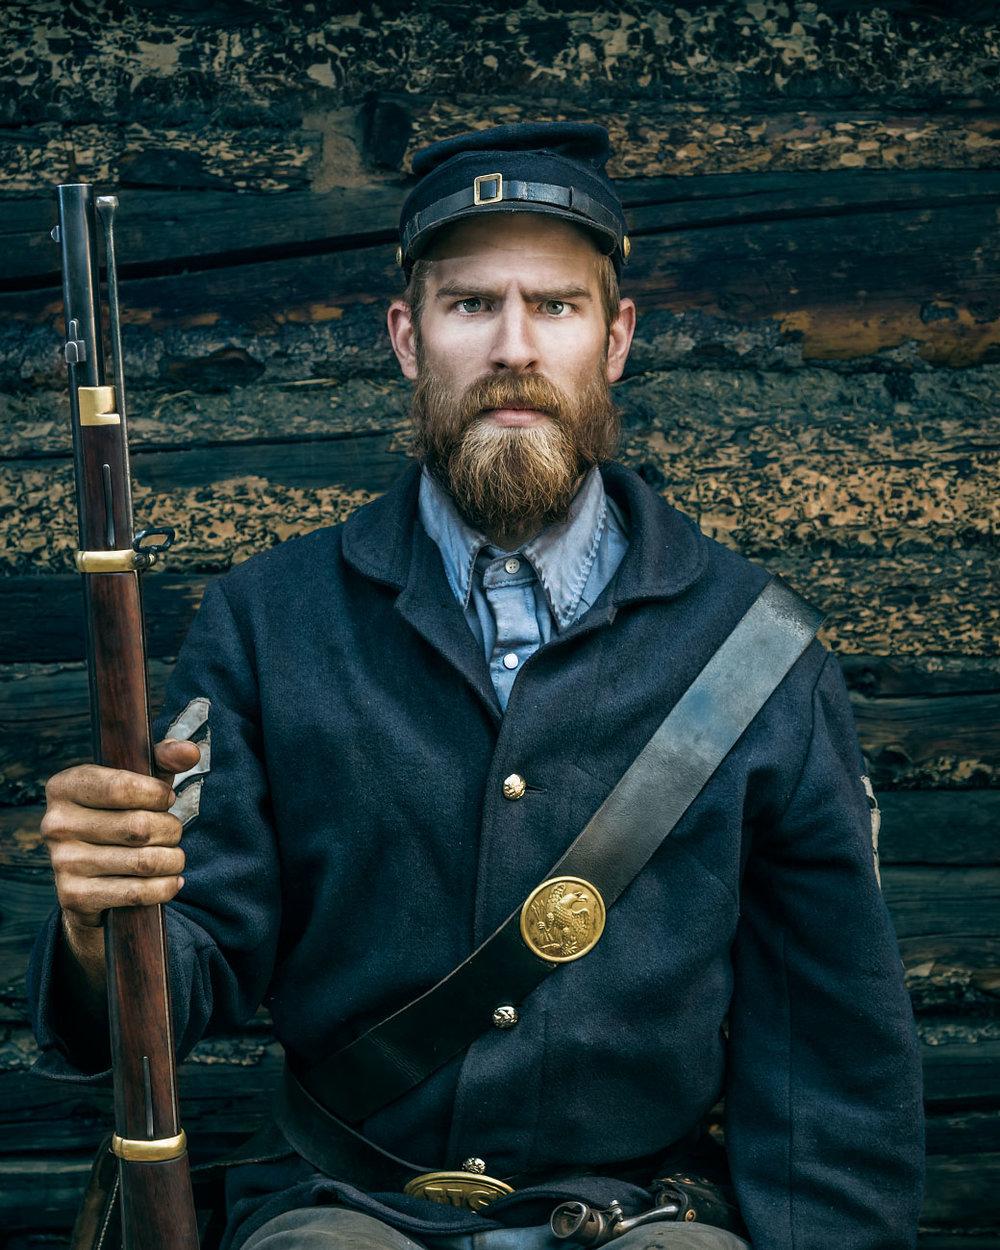 Evan-Withrow-Black-Mountain-Philmont-Scout-Ranch-Cimarron-New-Mexico.jpg